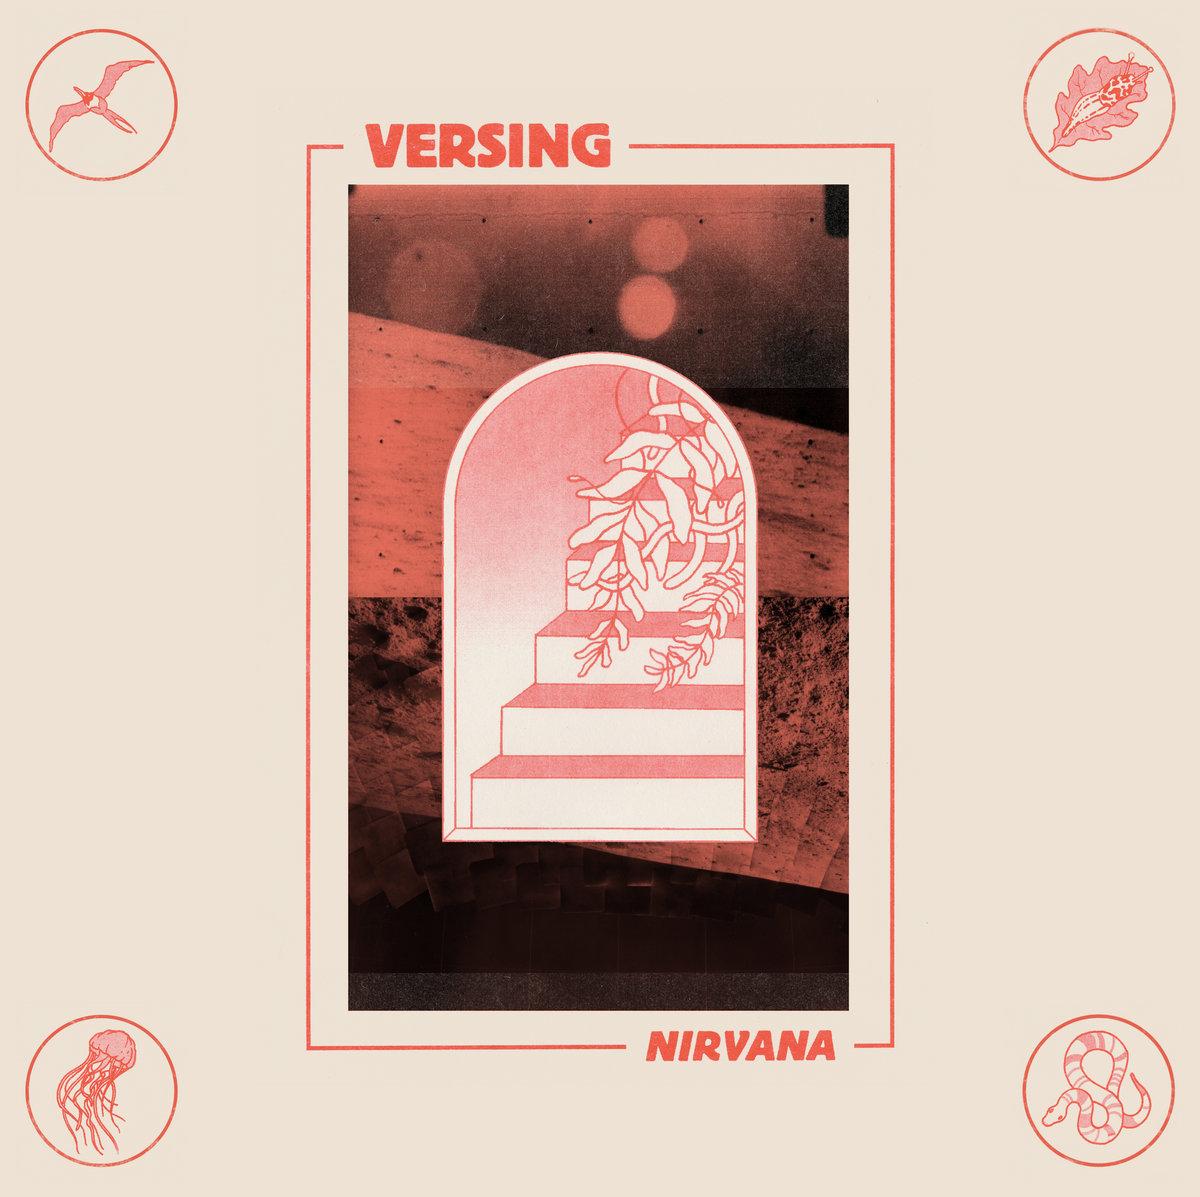 Nirvana | Versing